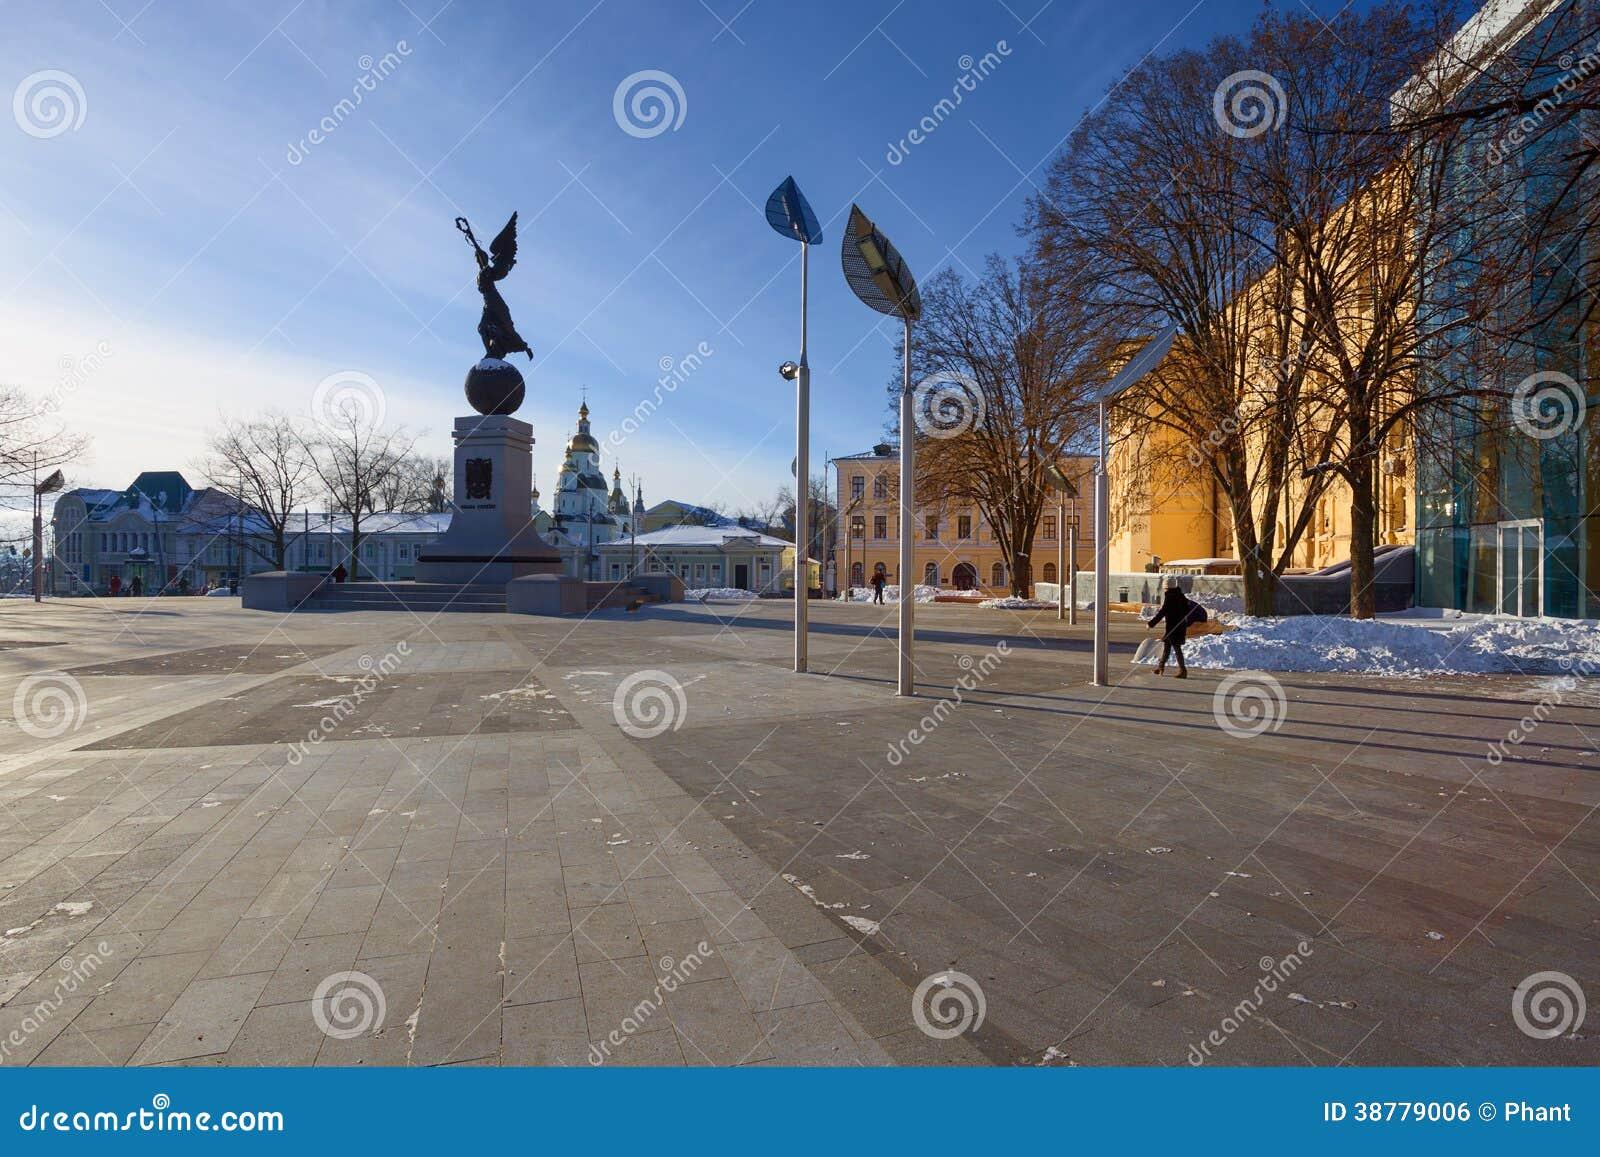 Квадрат в Харькове. Украина.